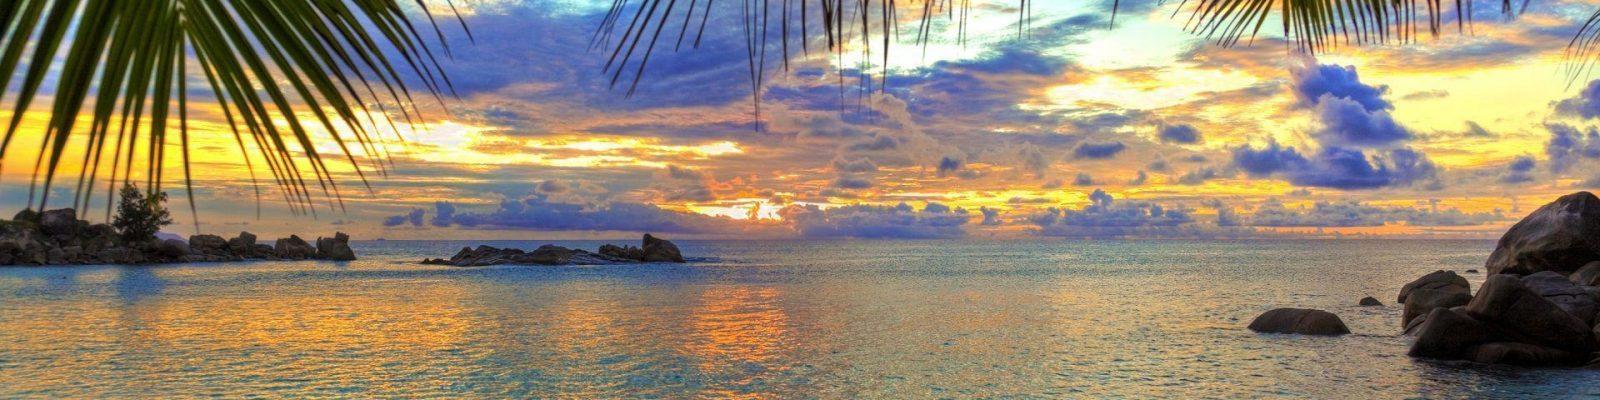 Sunny beach sunset